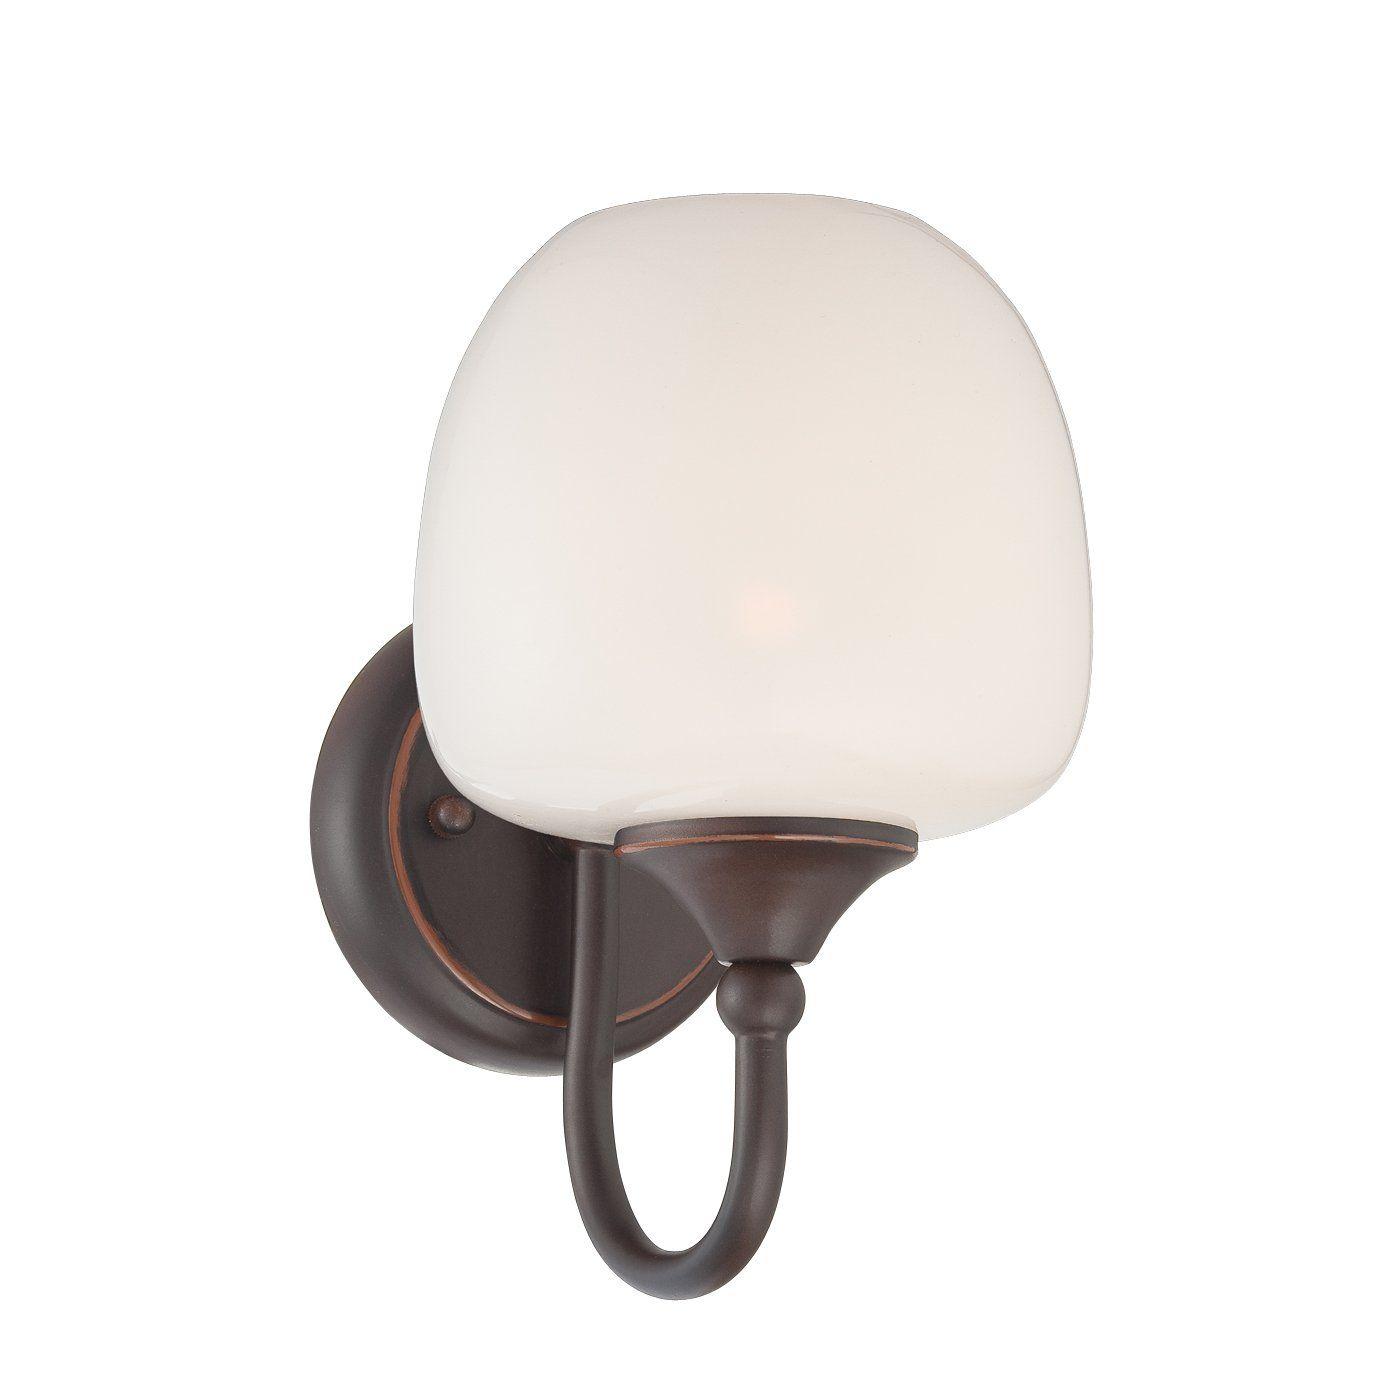 Eurofase Lighting 20382 0 Paloma Wall Sconce Atg Stores Bronze Sconces Sconces Wall Sconces